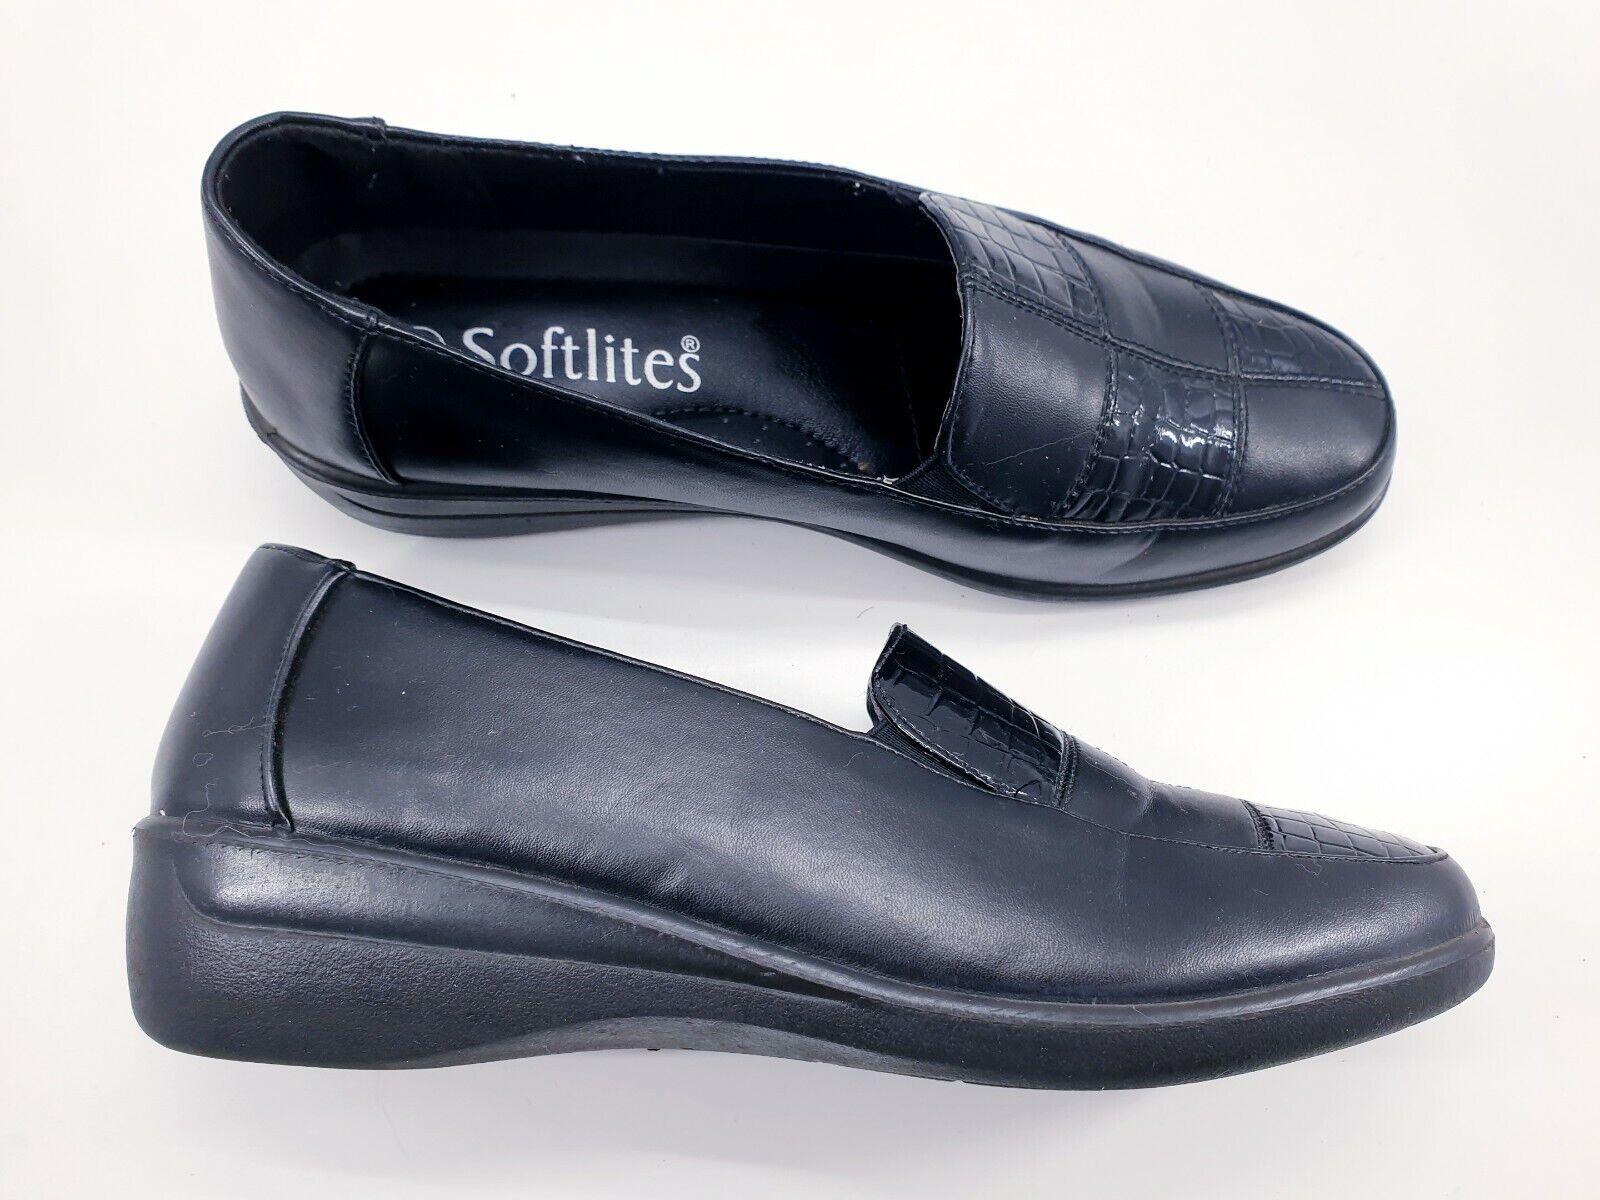 Softlites size 7 (40) black faux leather slip on wedge heel comfort loafers